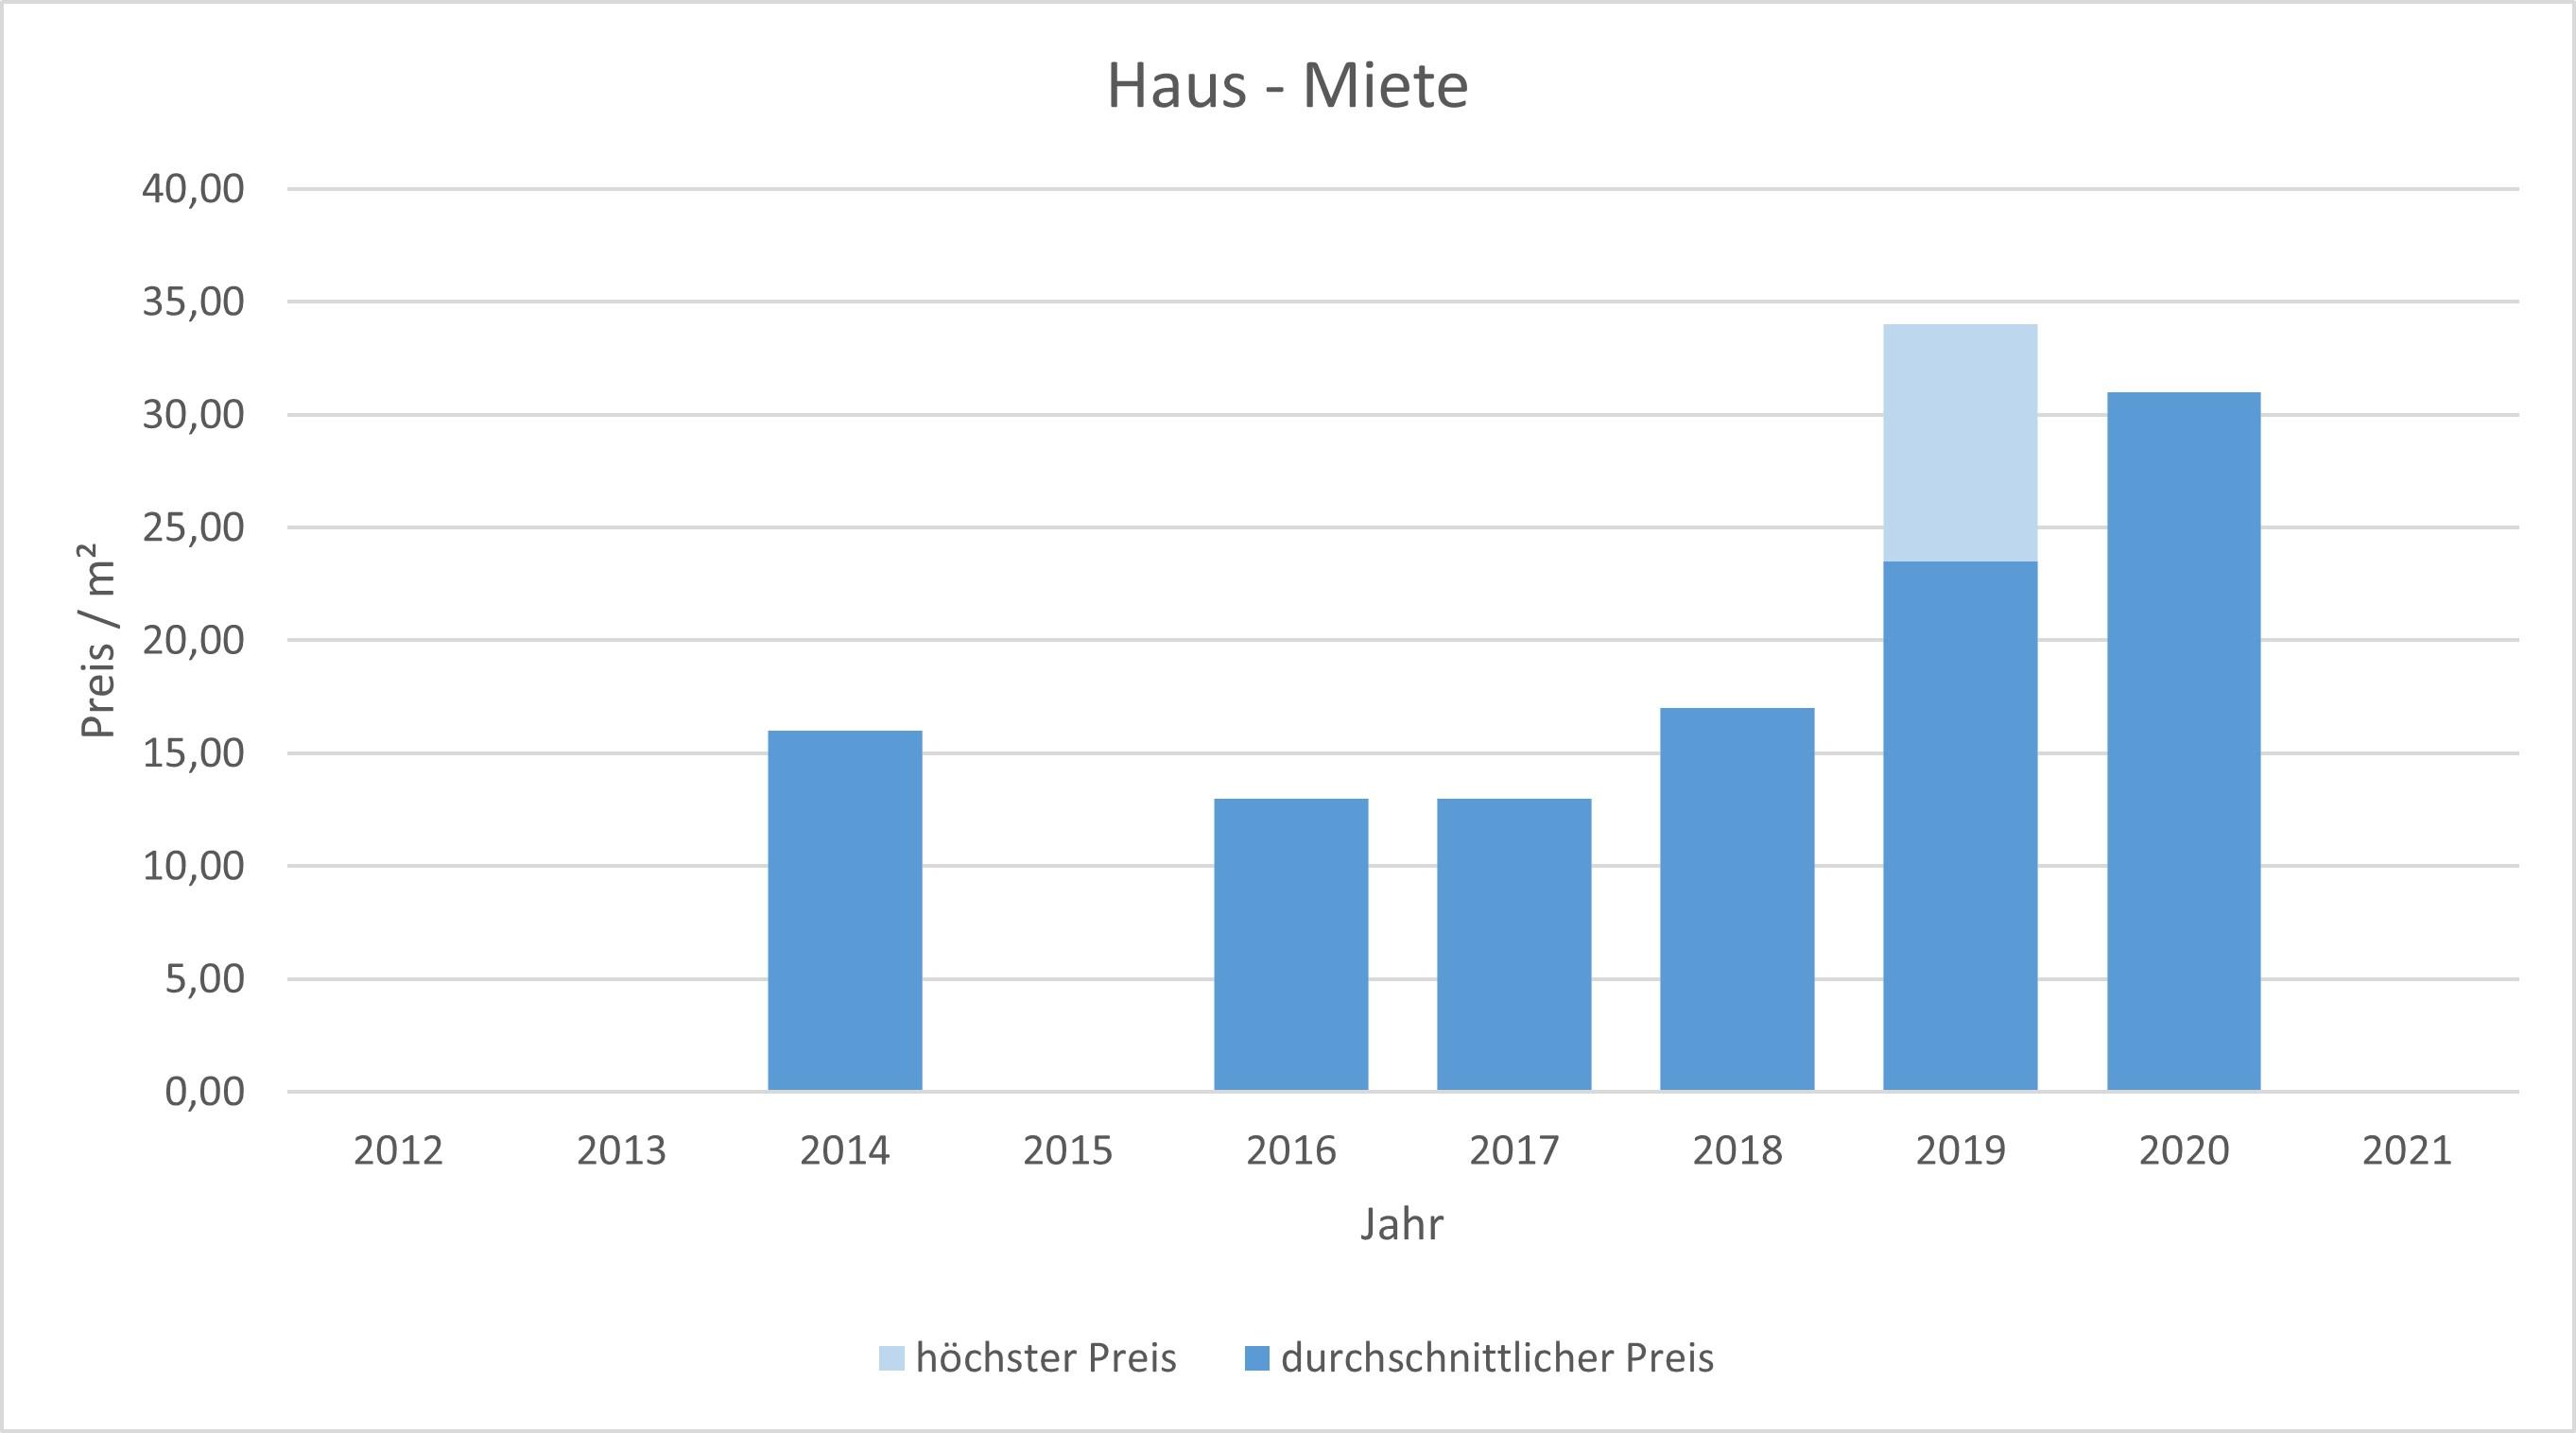 München - Isarvorstadt Haus mieten vermieten Preis Bewertung Makler 2019 2020 2021 www.happy-immo.de